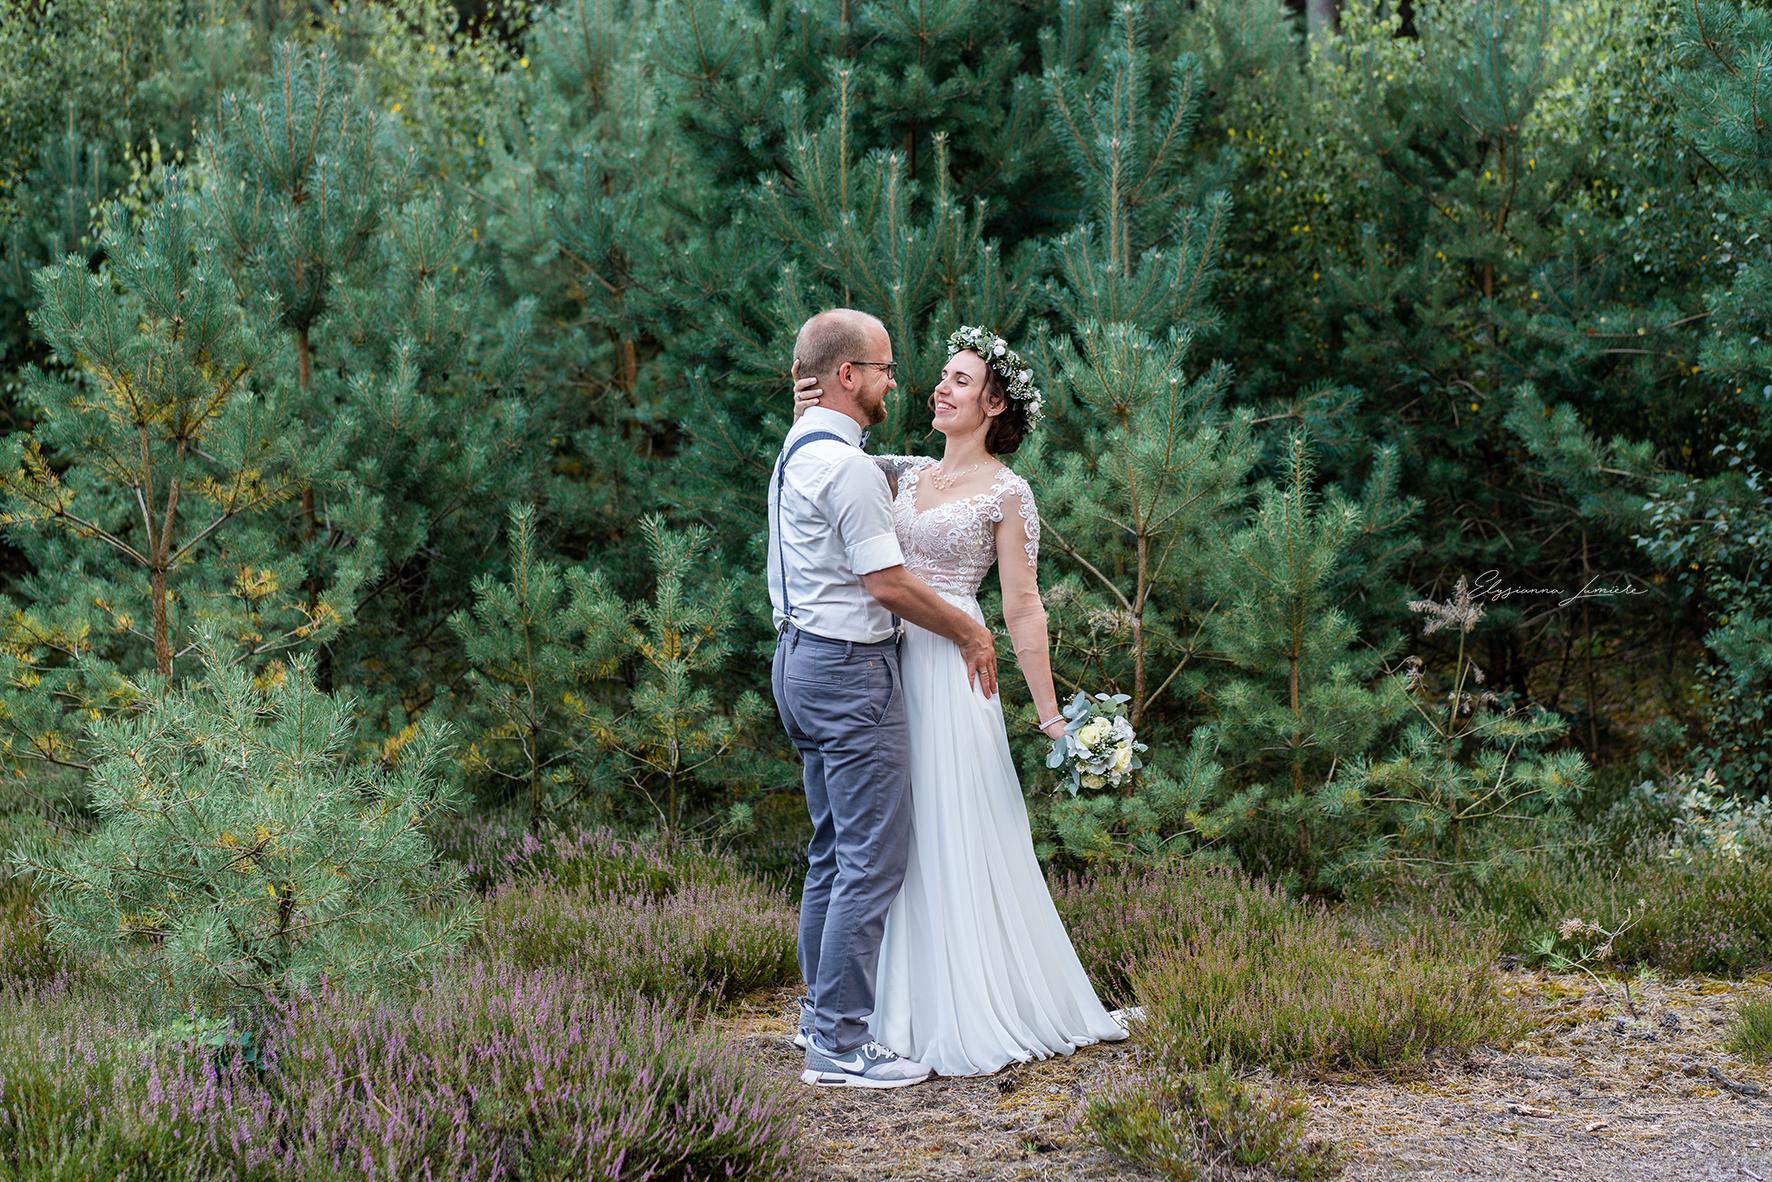 Brautpaar tanzt im Wald Boho Vintage I Elysianna Lumiere Photography